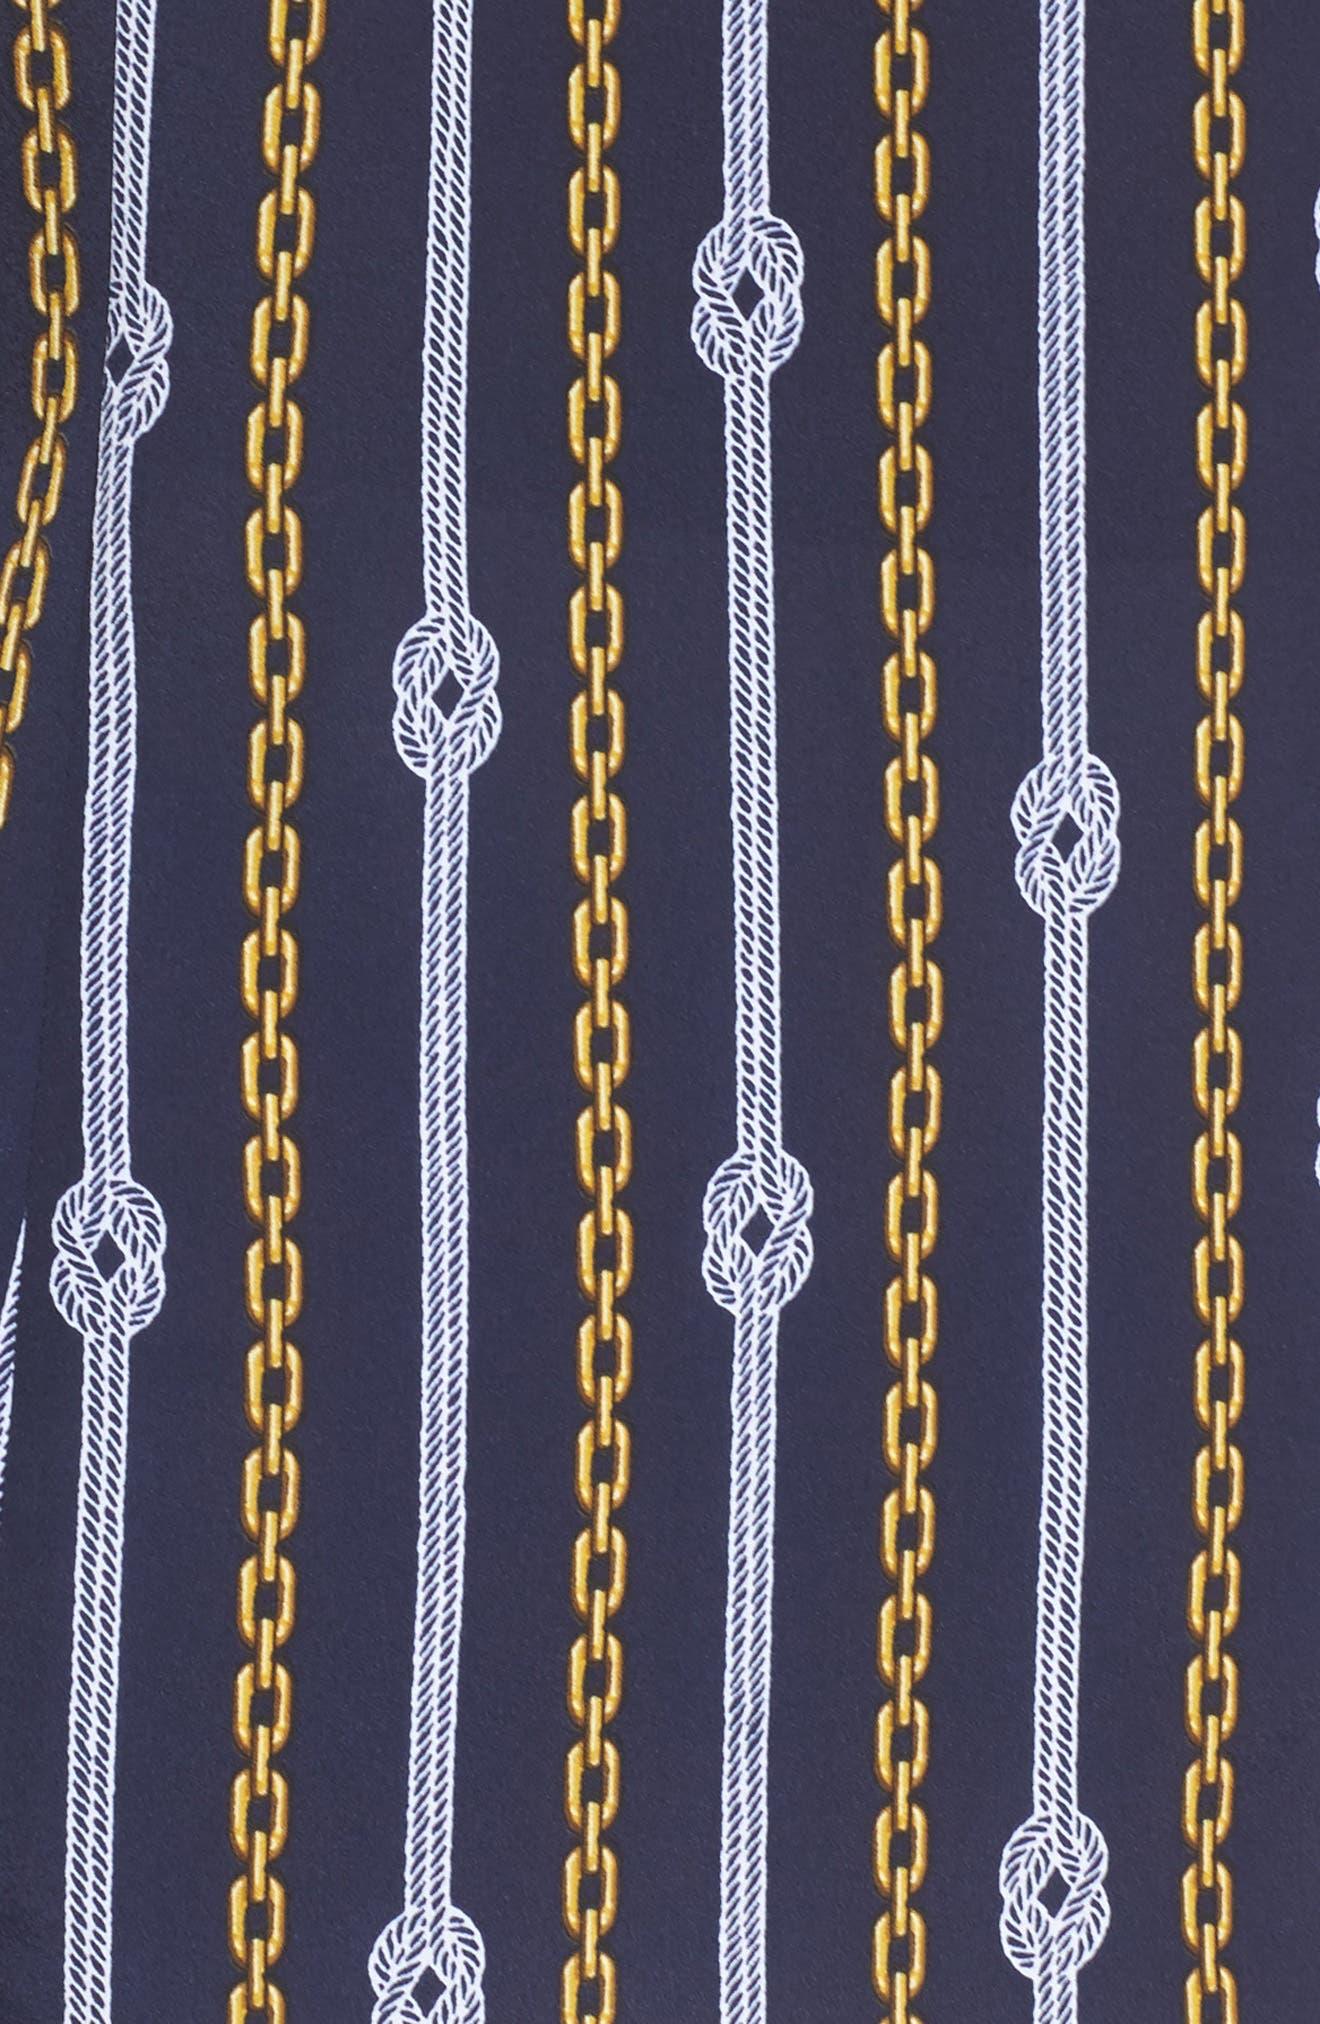 Print Zip Front Top,                             Alternate thumbnail 5, color,                             True Navy/ Gold